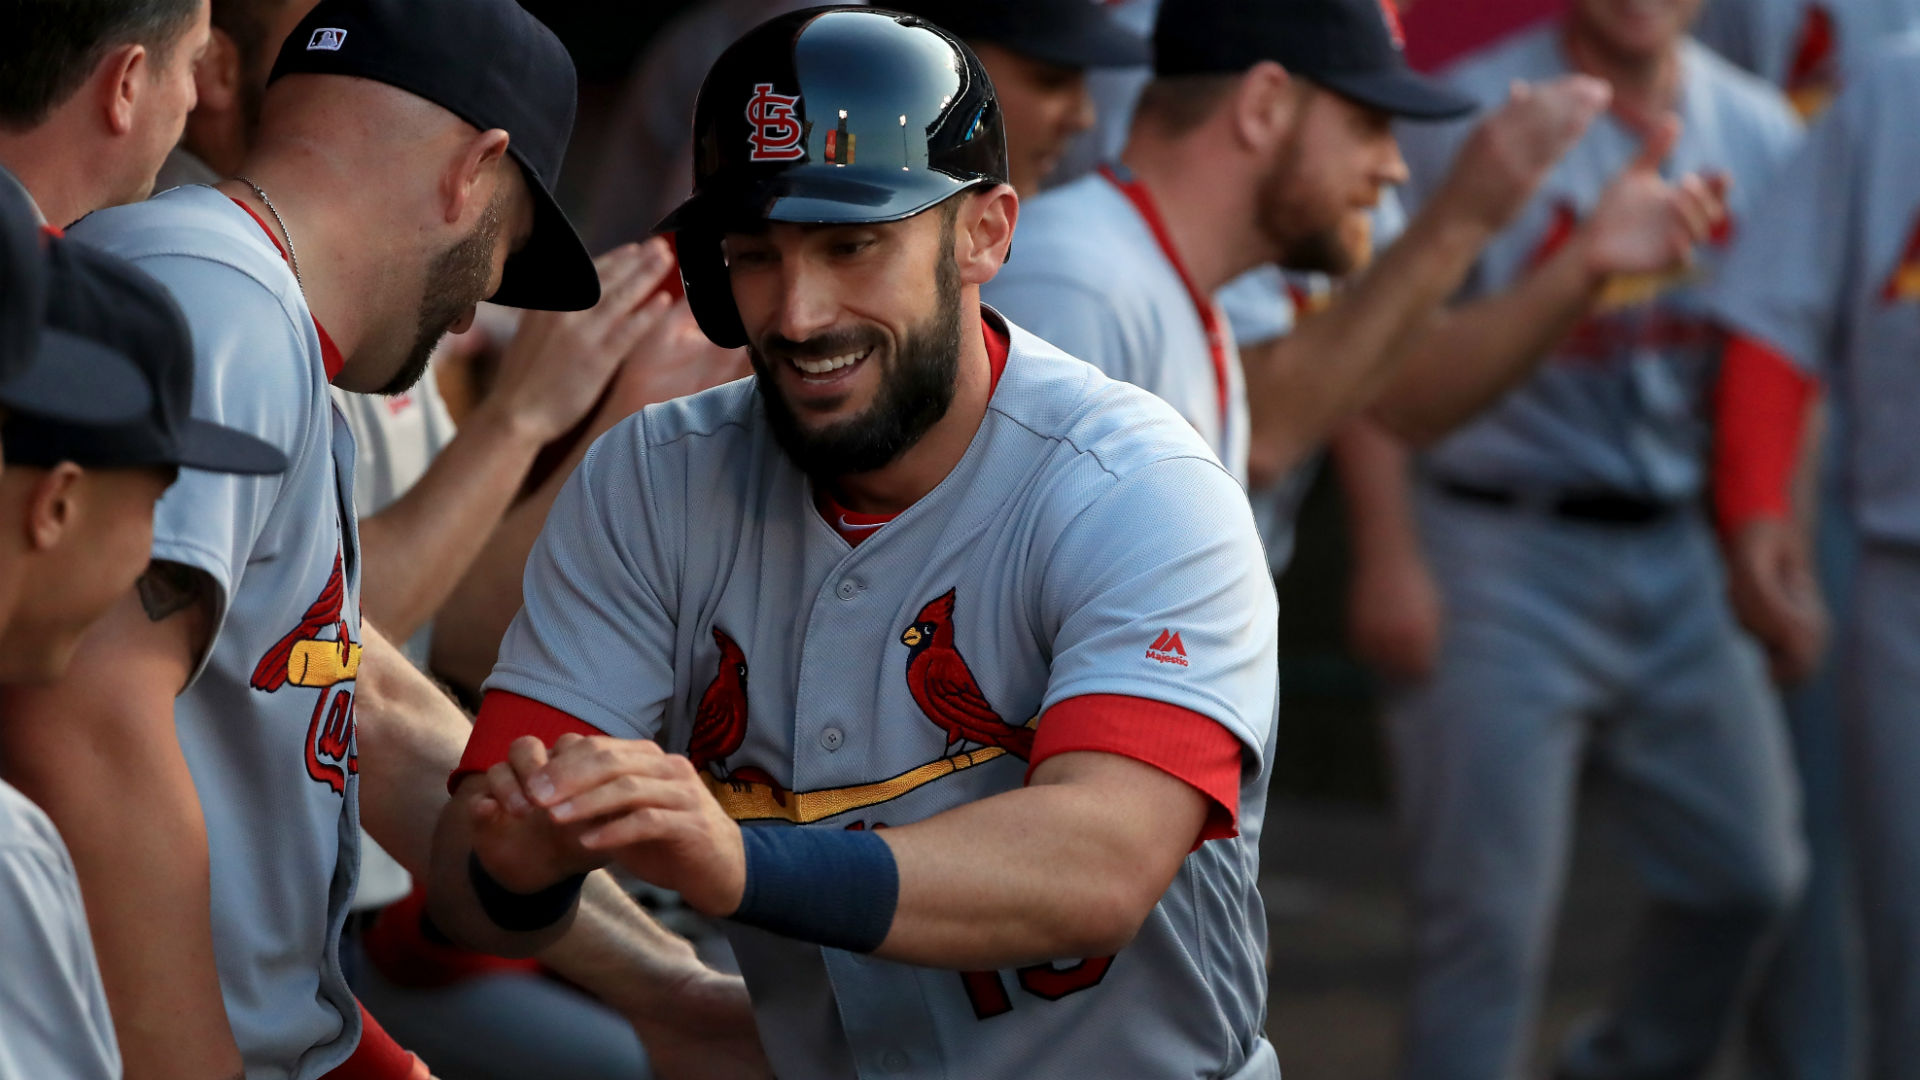 Cardinals' Matt Carpenter took 6 innings to do something never before done